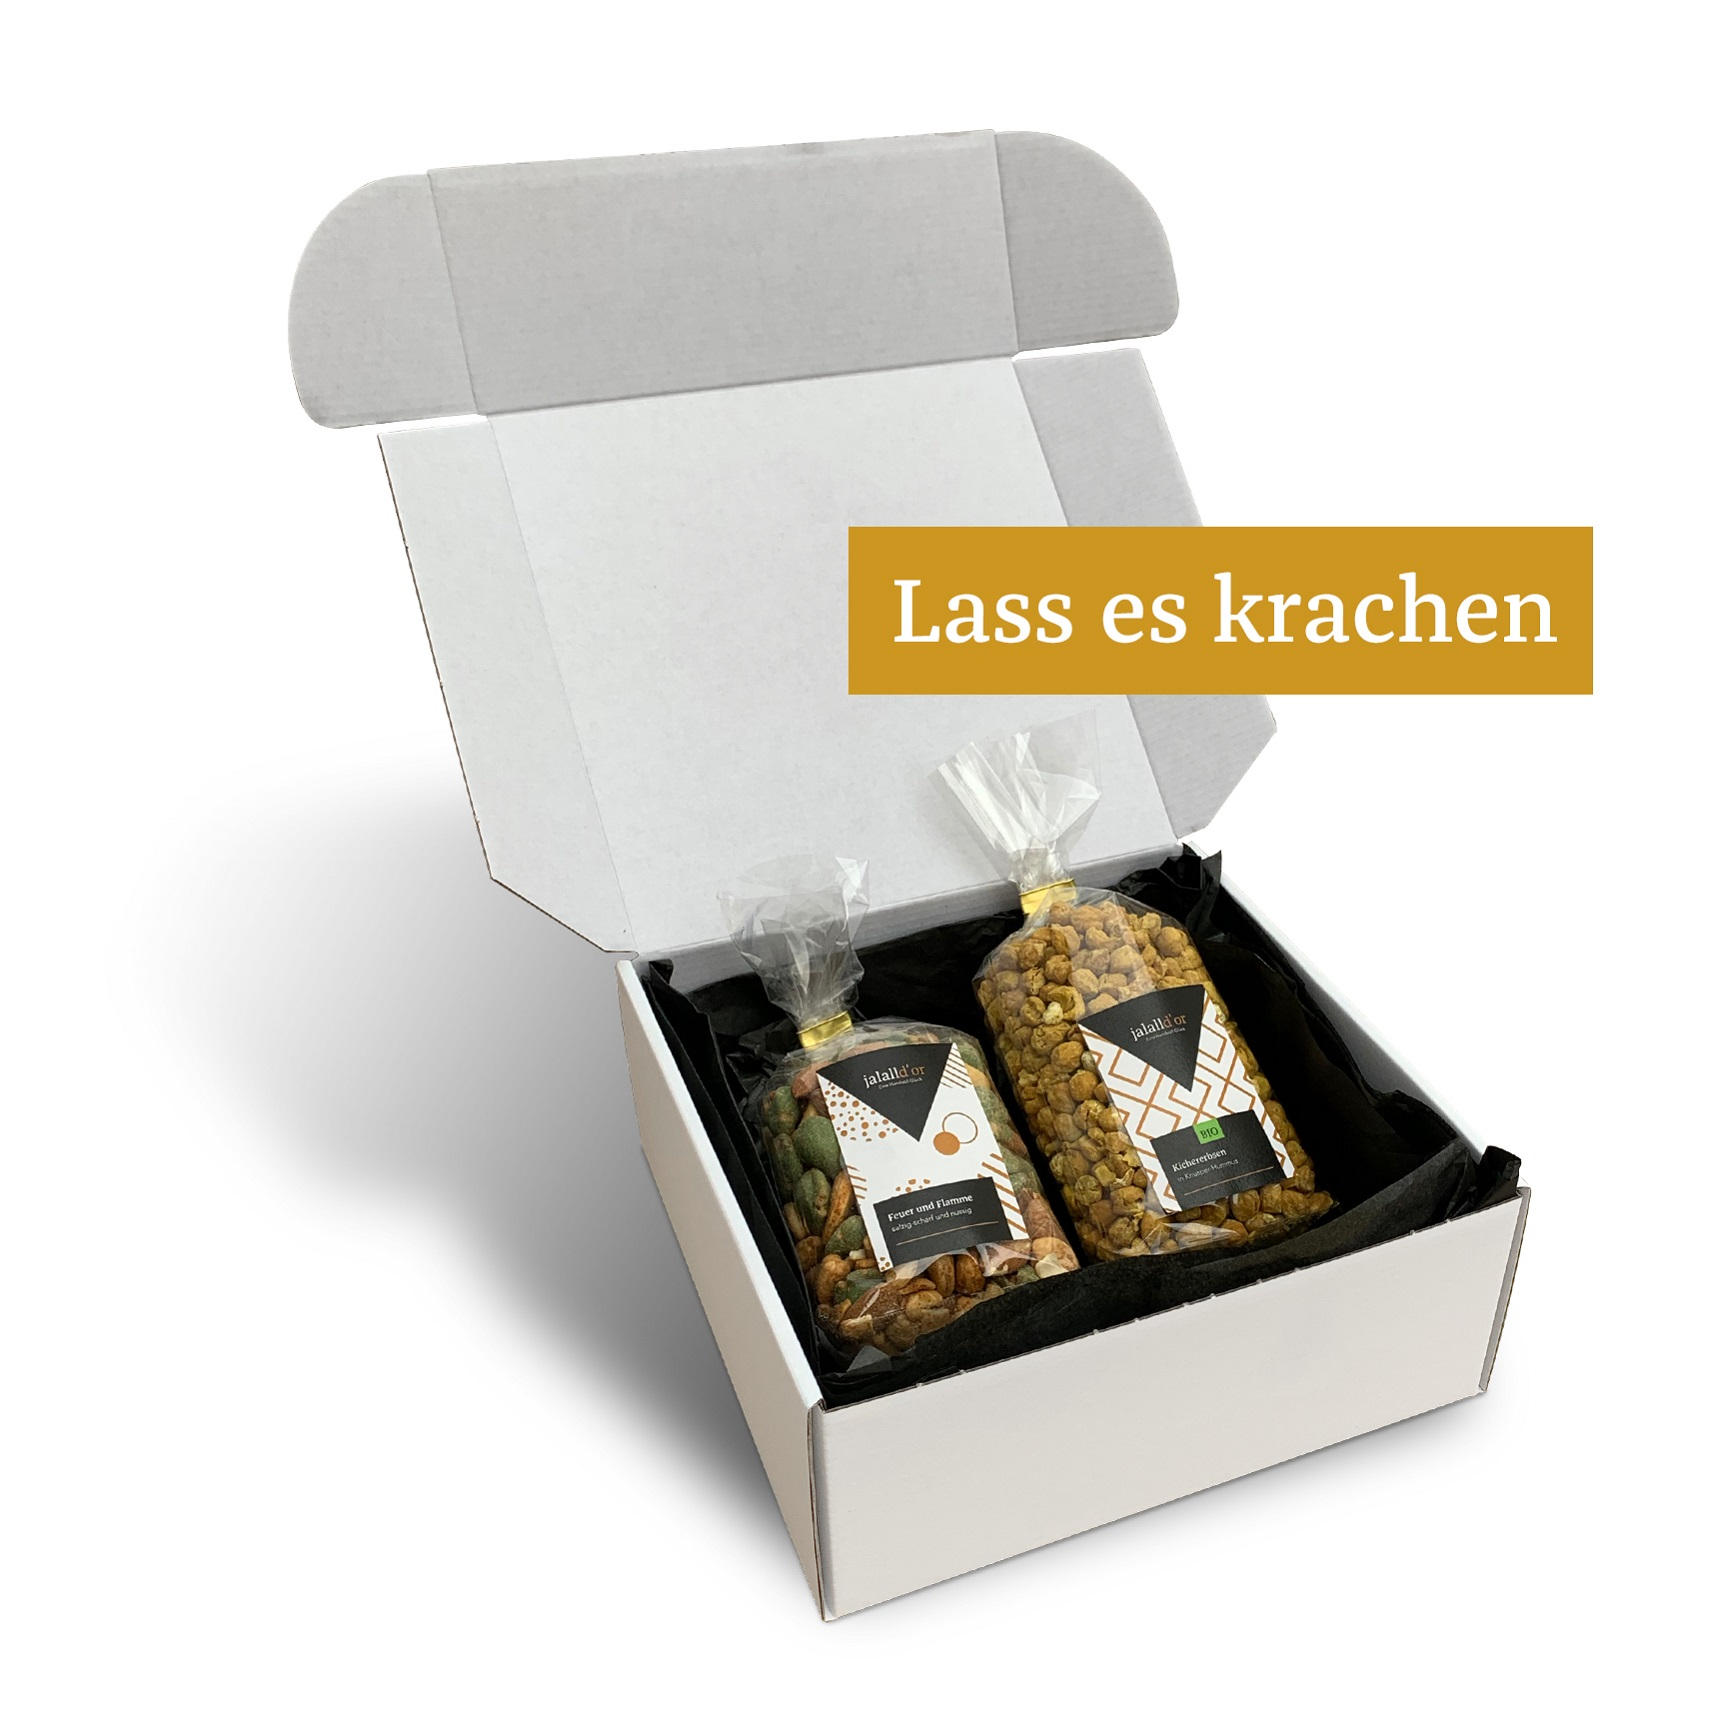 Mischungsbox-Lasseskrachen-2er